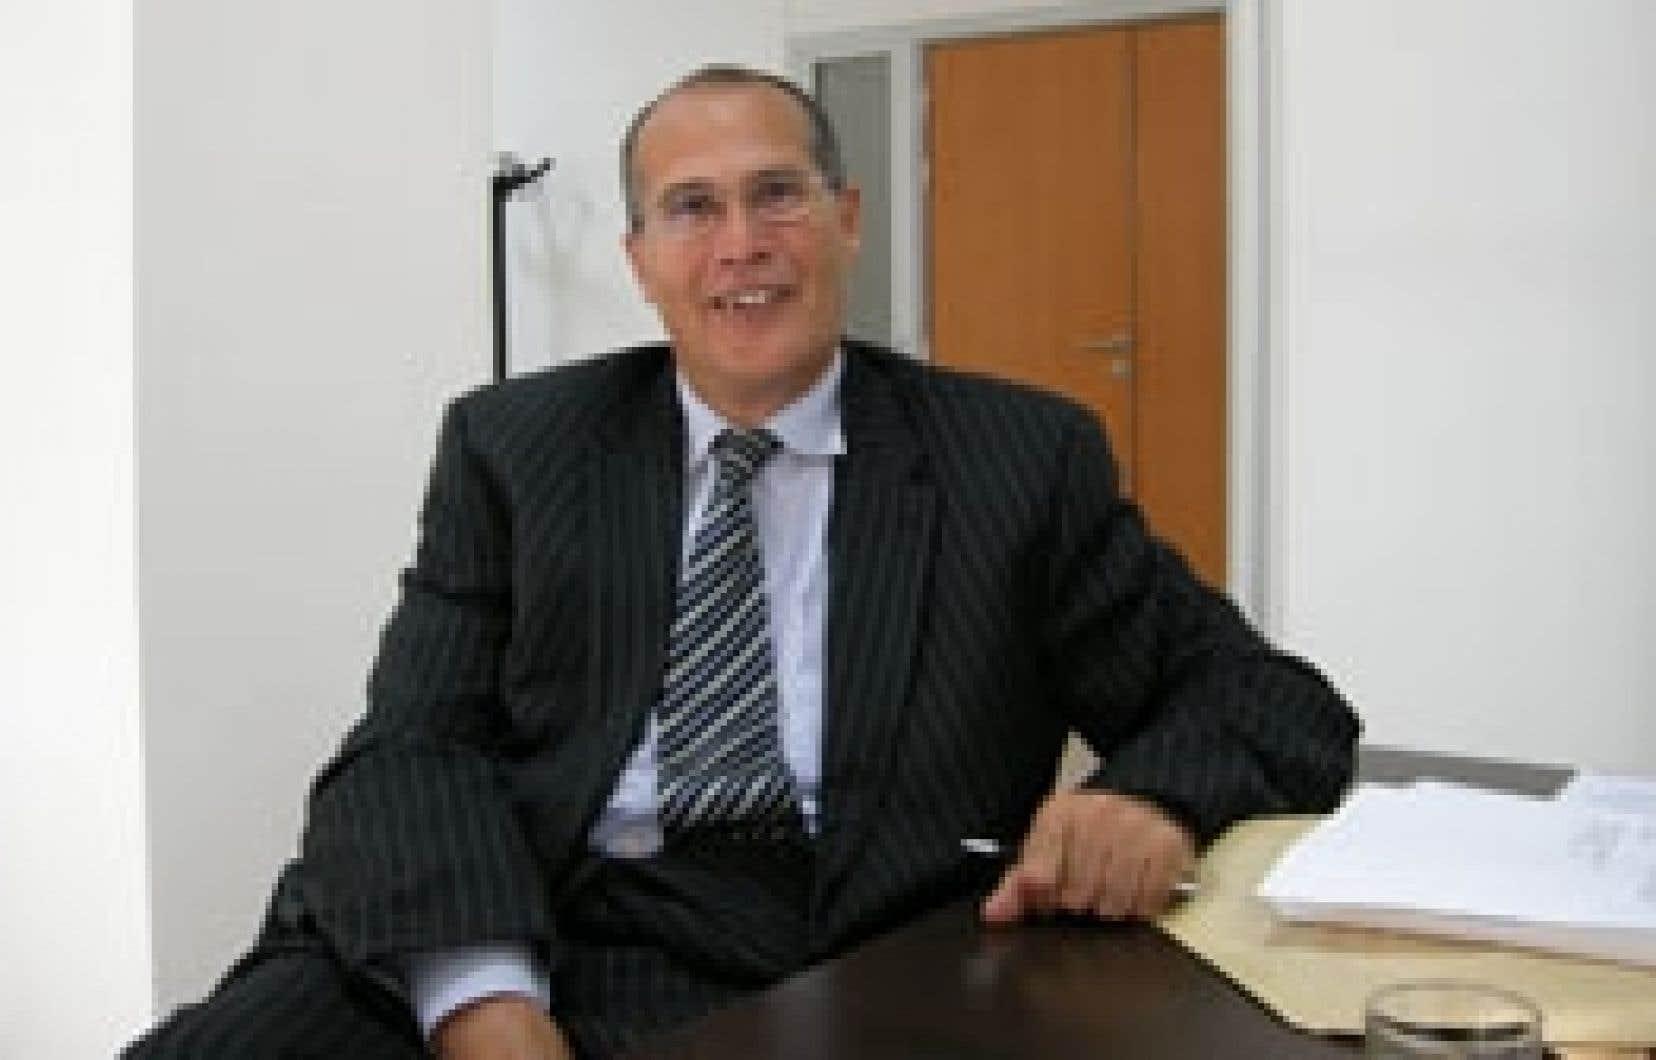 Abdelhak Eddoubi. Photo: Monique Durand